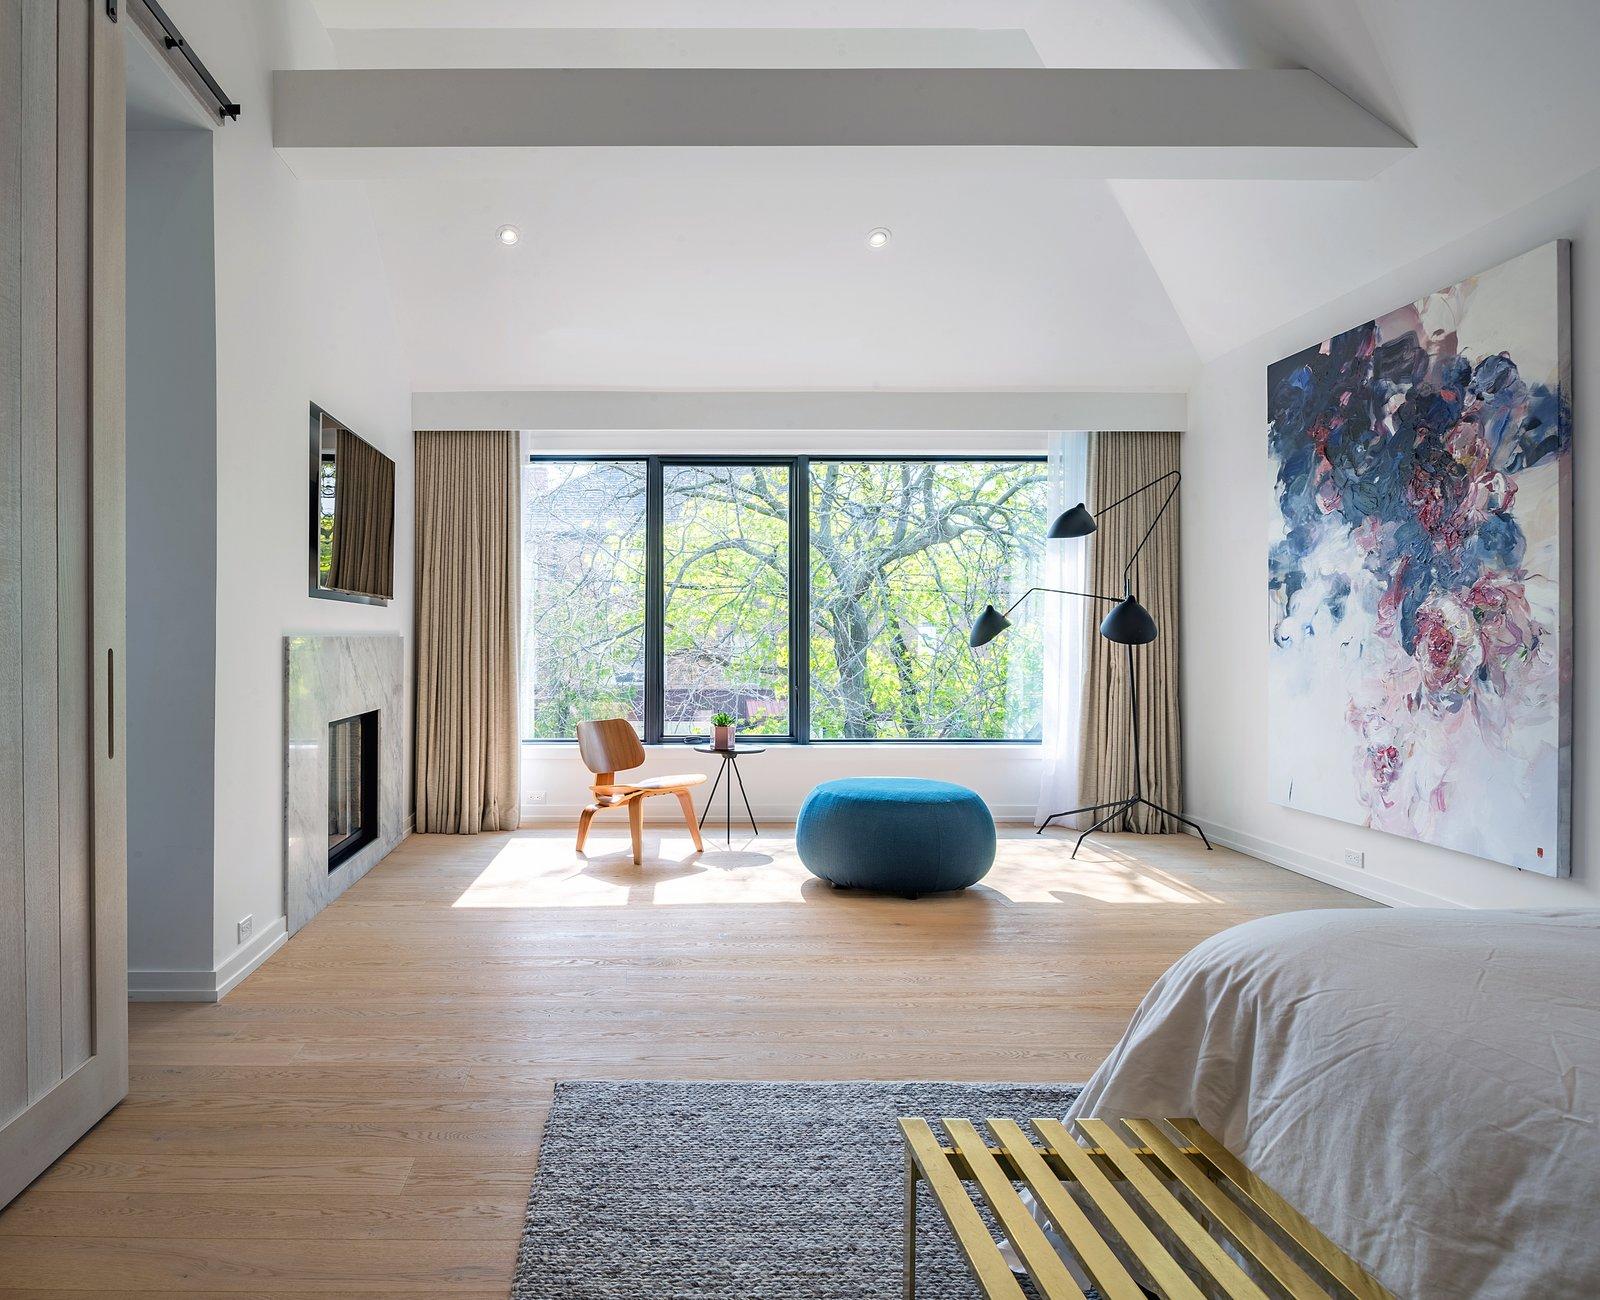 Bedroom, Ceiling Lighting, Lamps, Bed, and Light Hardwood Floor  Richview Residence